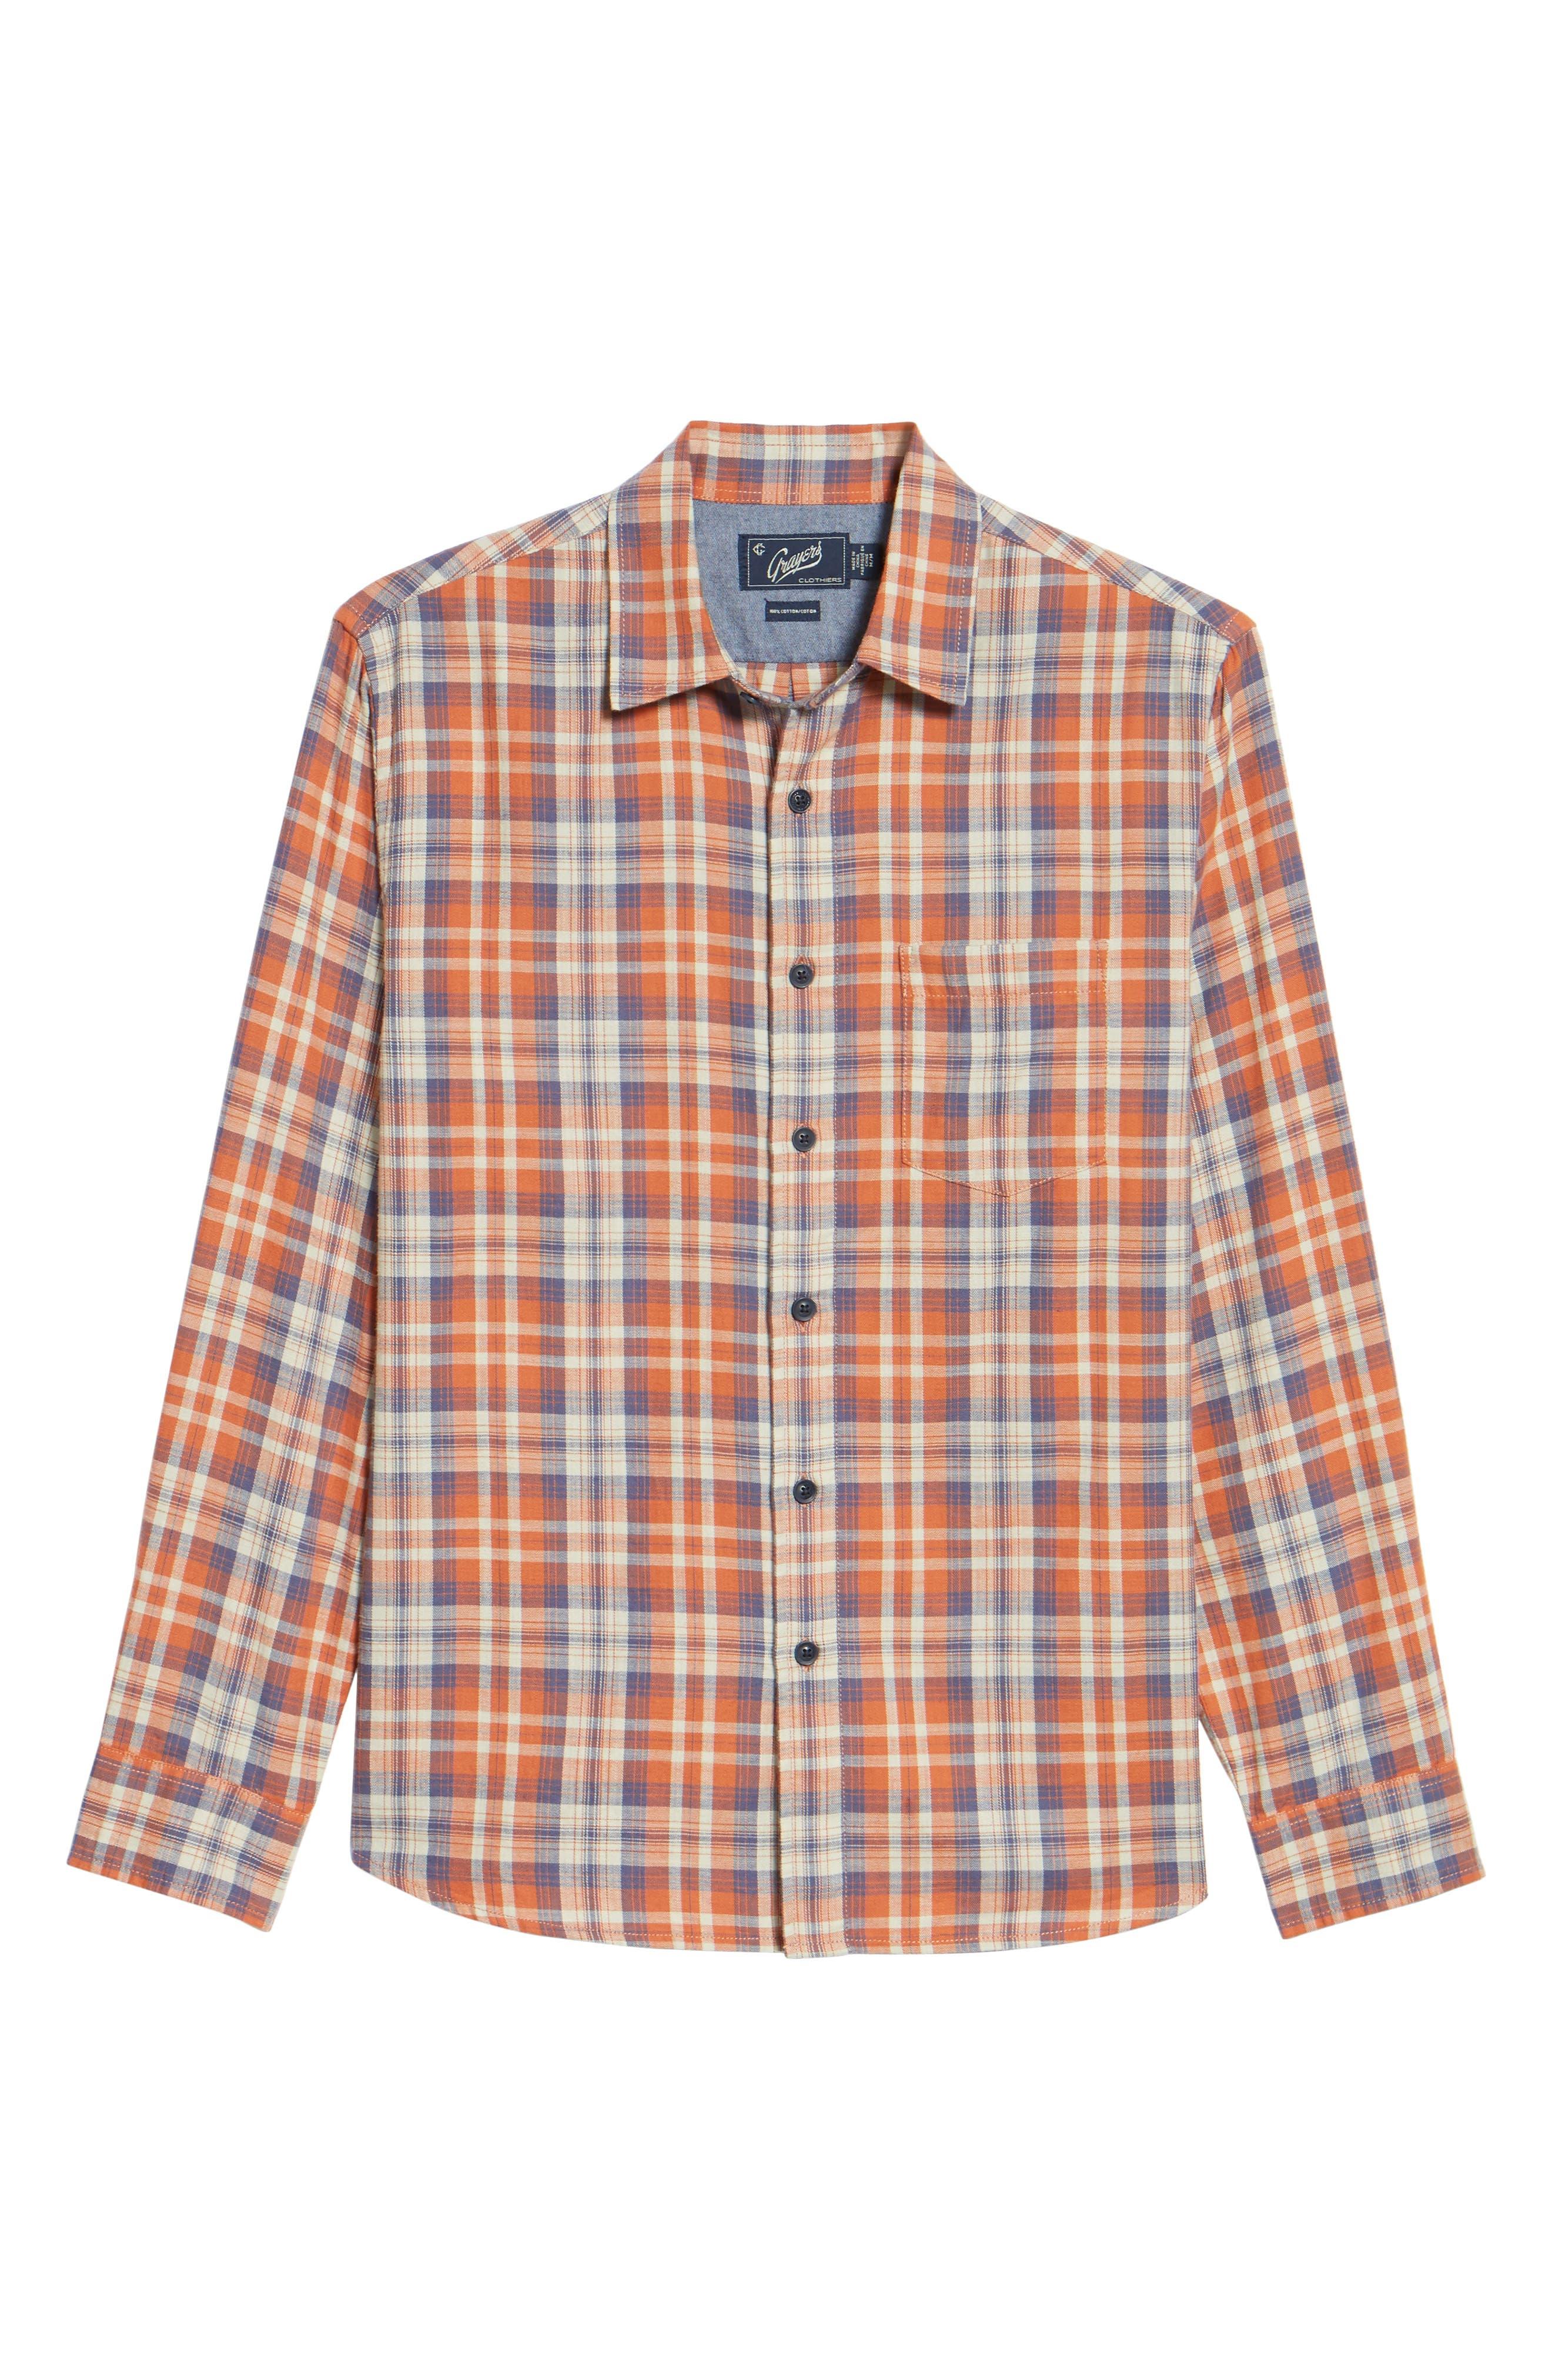 Scottsdale Slim Fit Plaid Slub Twill Sport Shirt,                             Alternate thumbnail 6, color,                             840